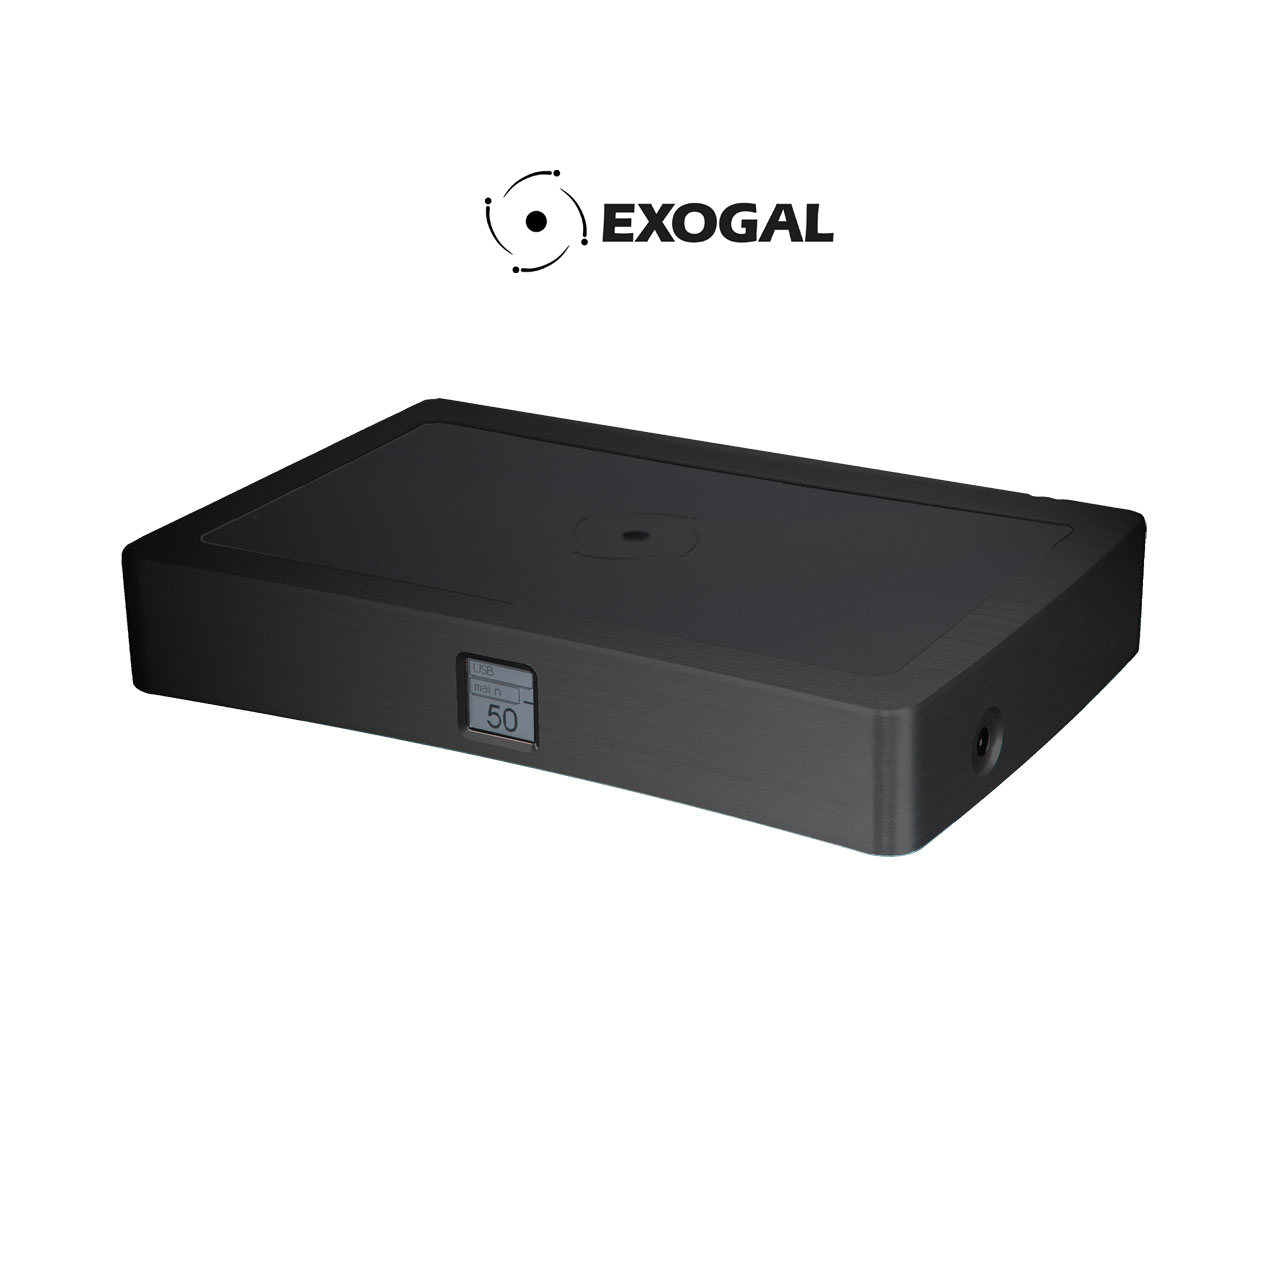 EXOGAL(エクソギャル) Comet